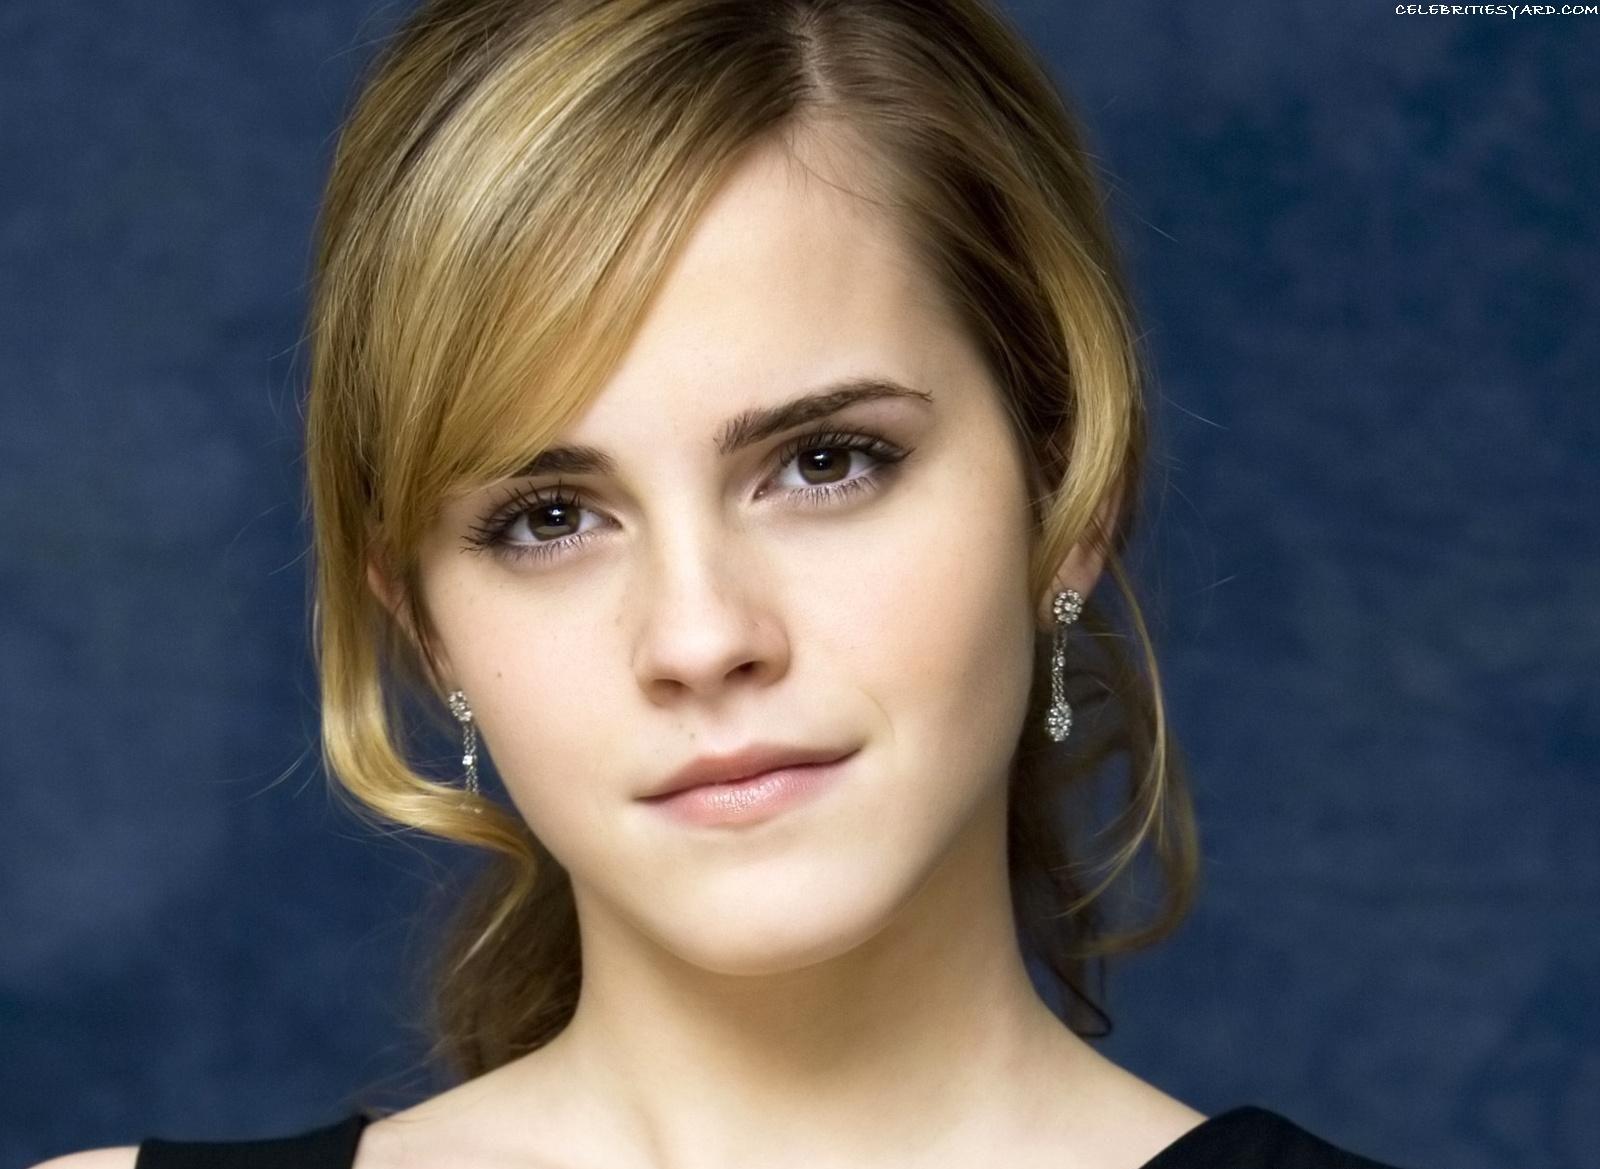 Emma Watson HD Wallpaper 1600x1169